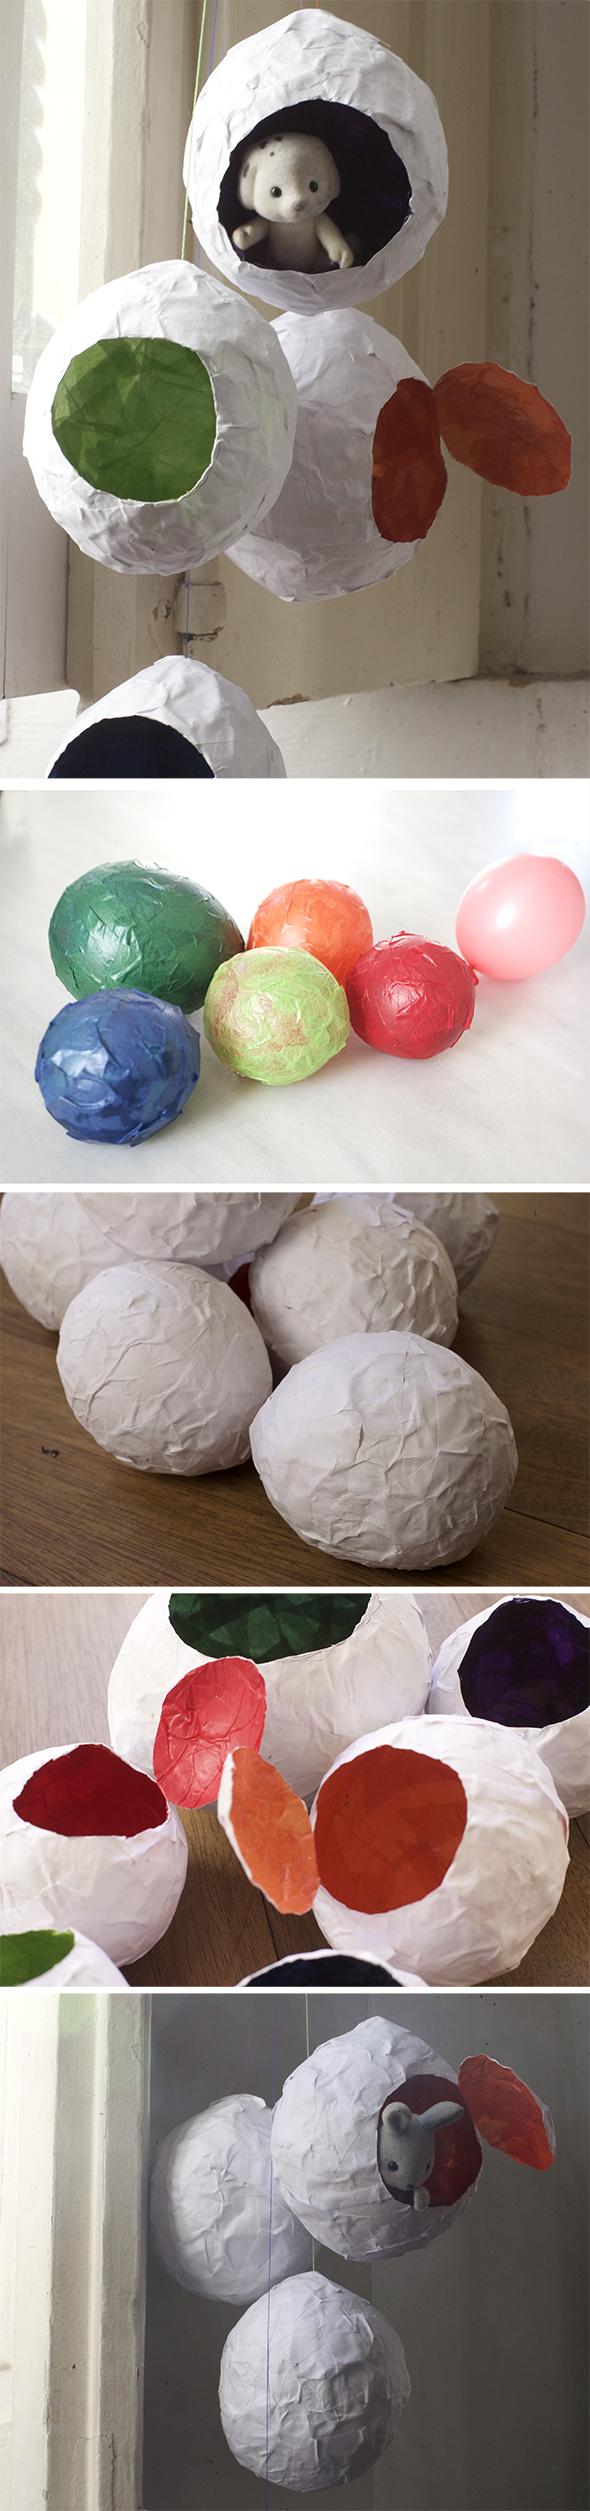 huevos eier eggs basteln maualidad craft diy deco deko easter pascua ostern kids niños kinder